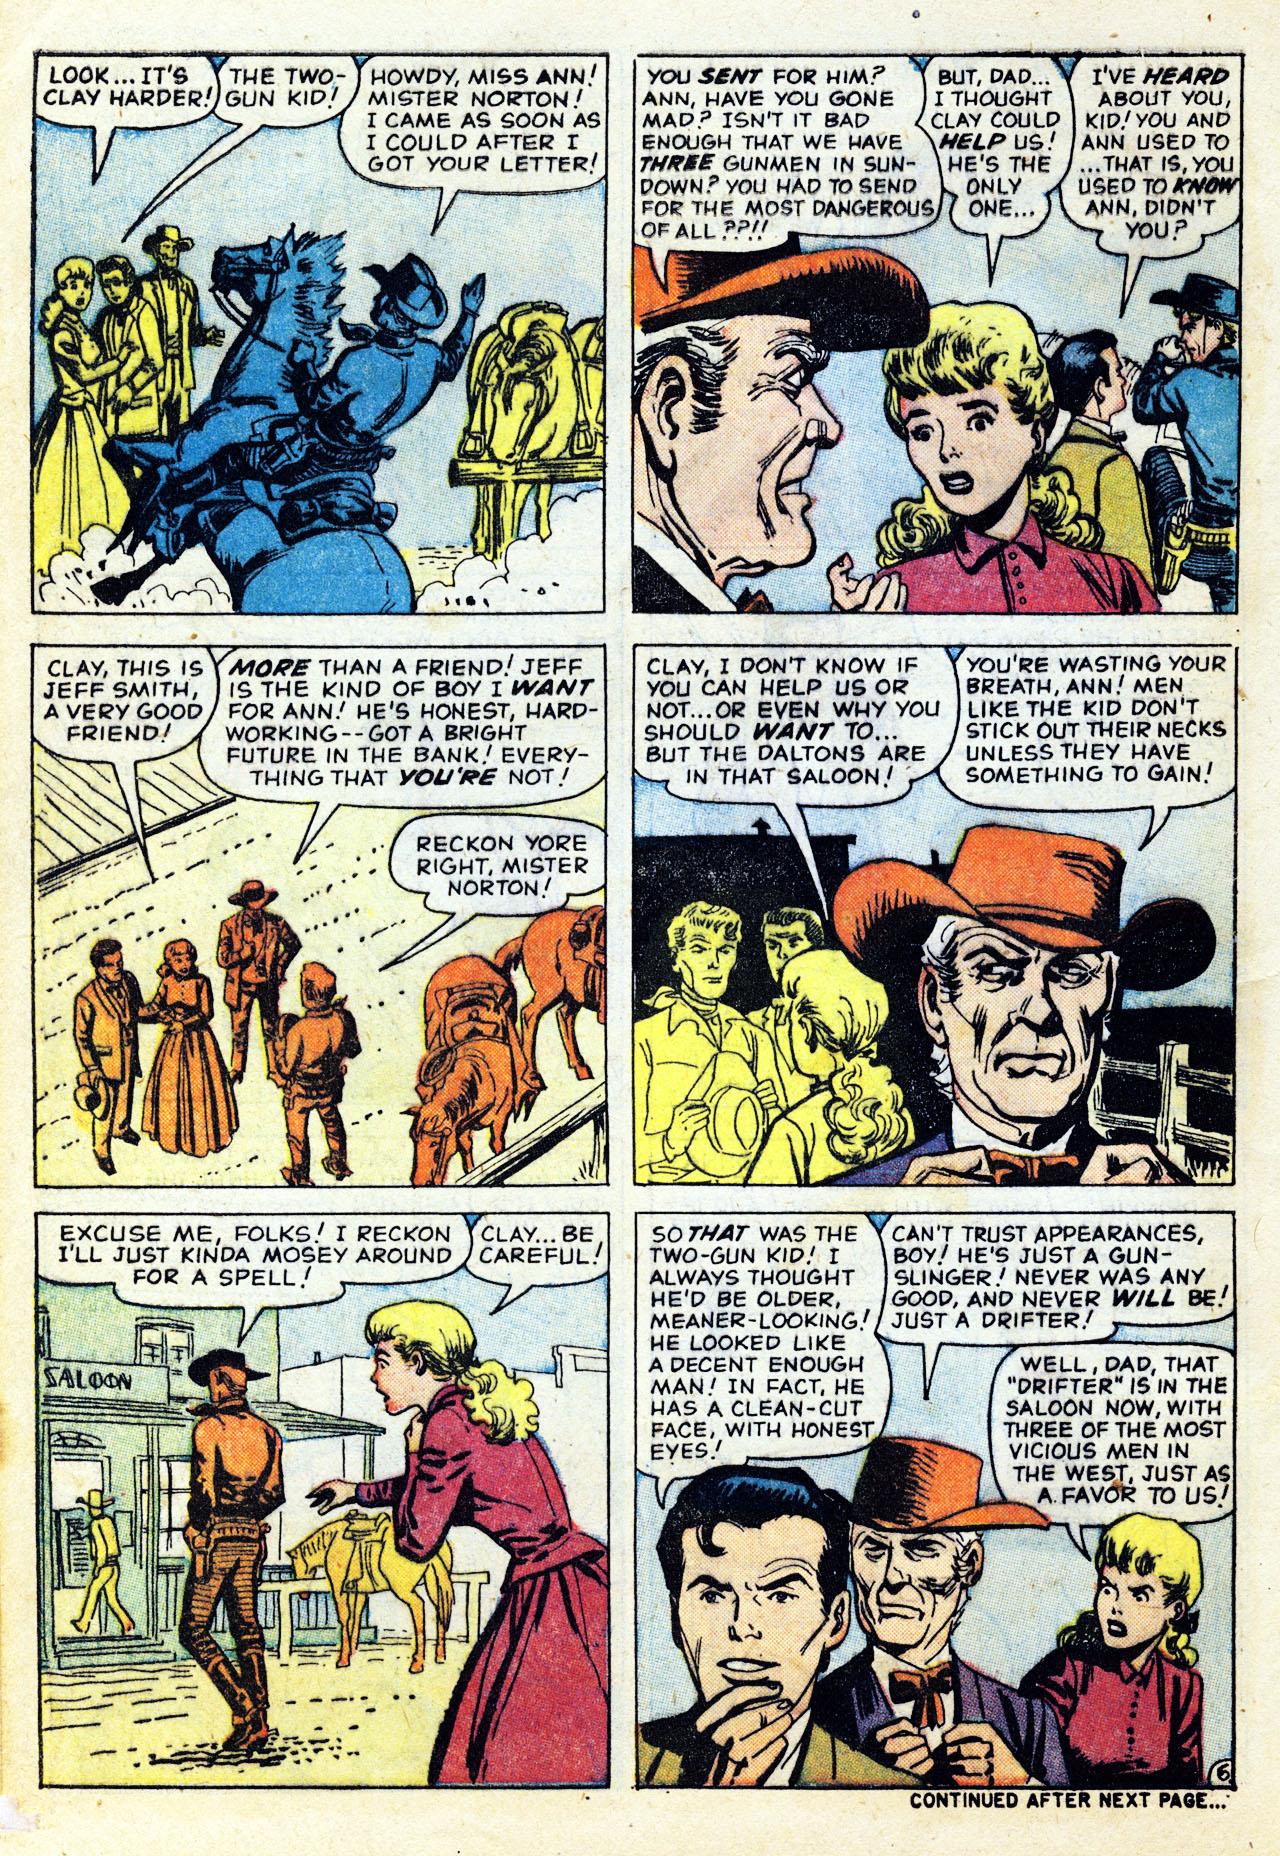 Read online Two-Gun Kid comic -  Issue #43 - 8